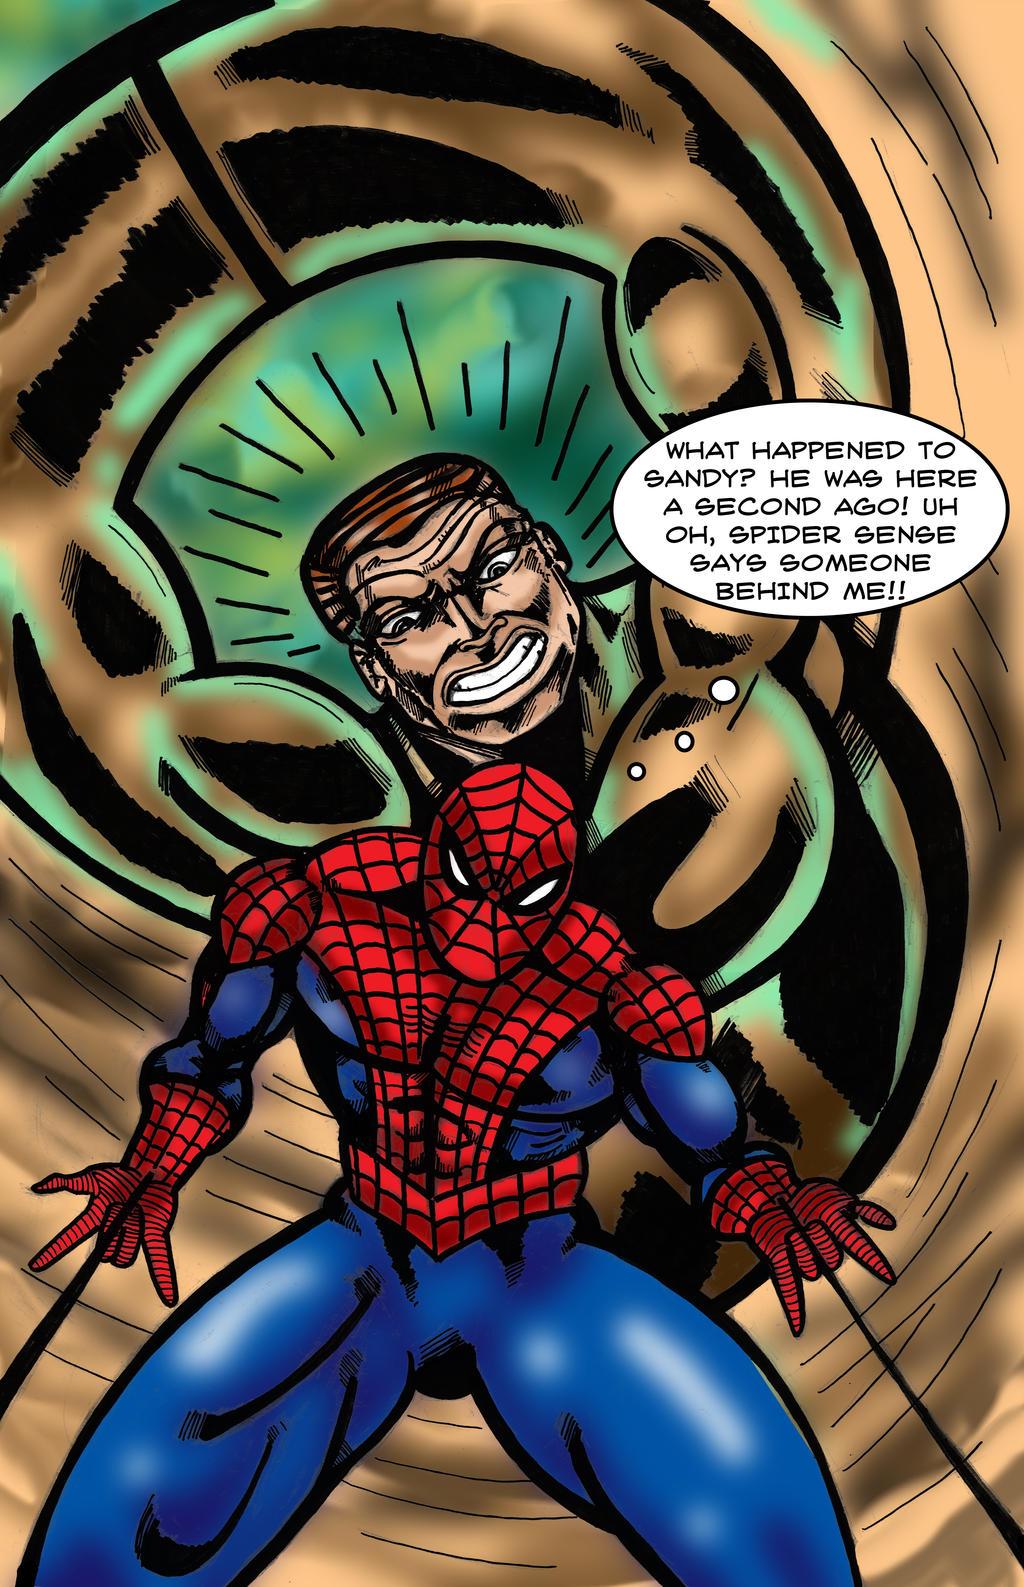 Spider-Man vs. Sandman by Dreamfires on DeviantArt